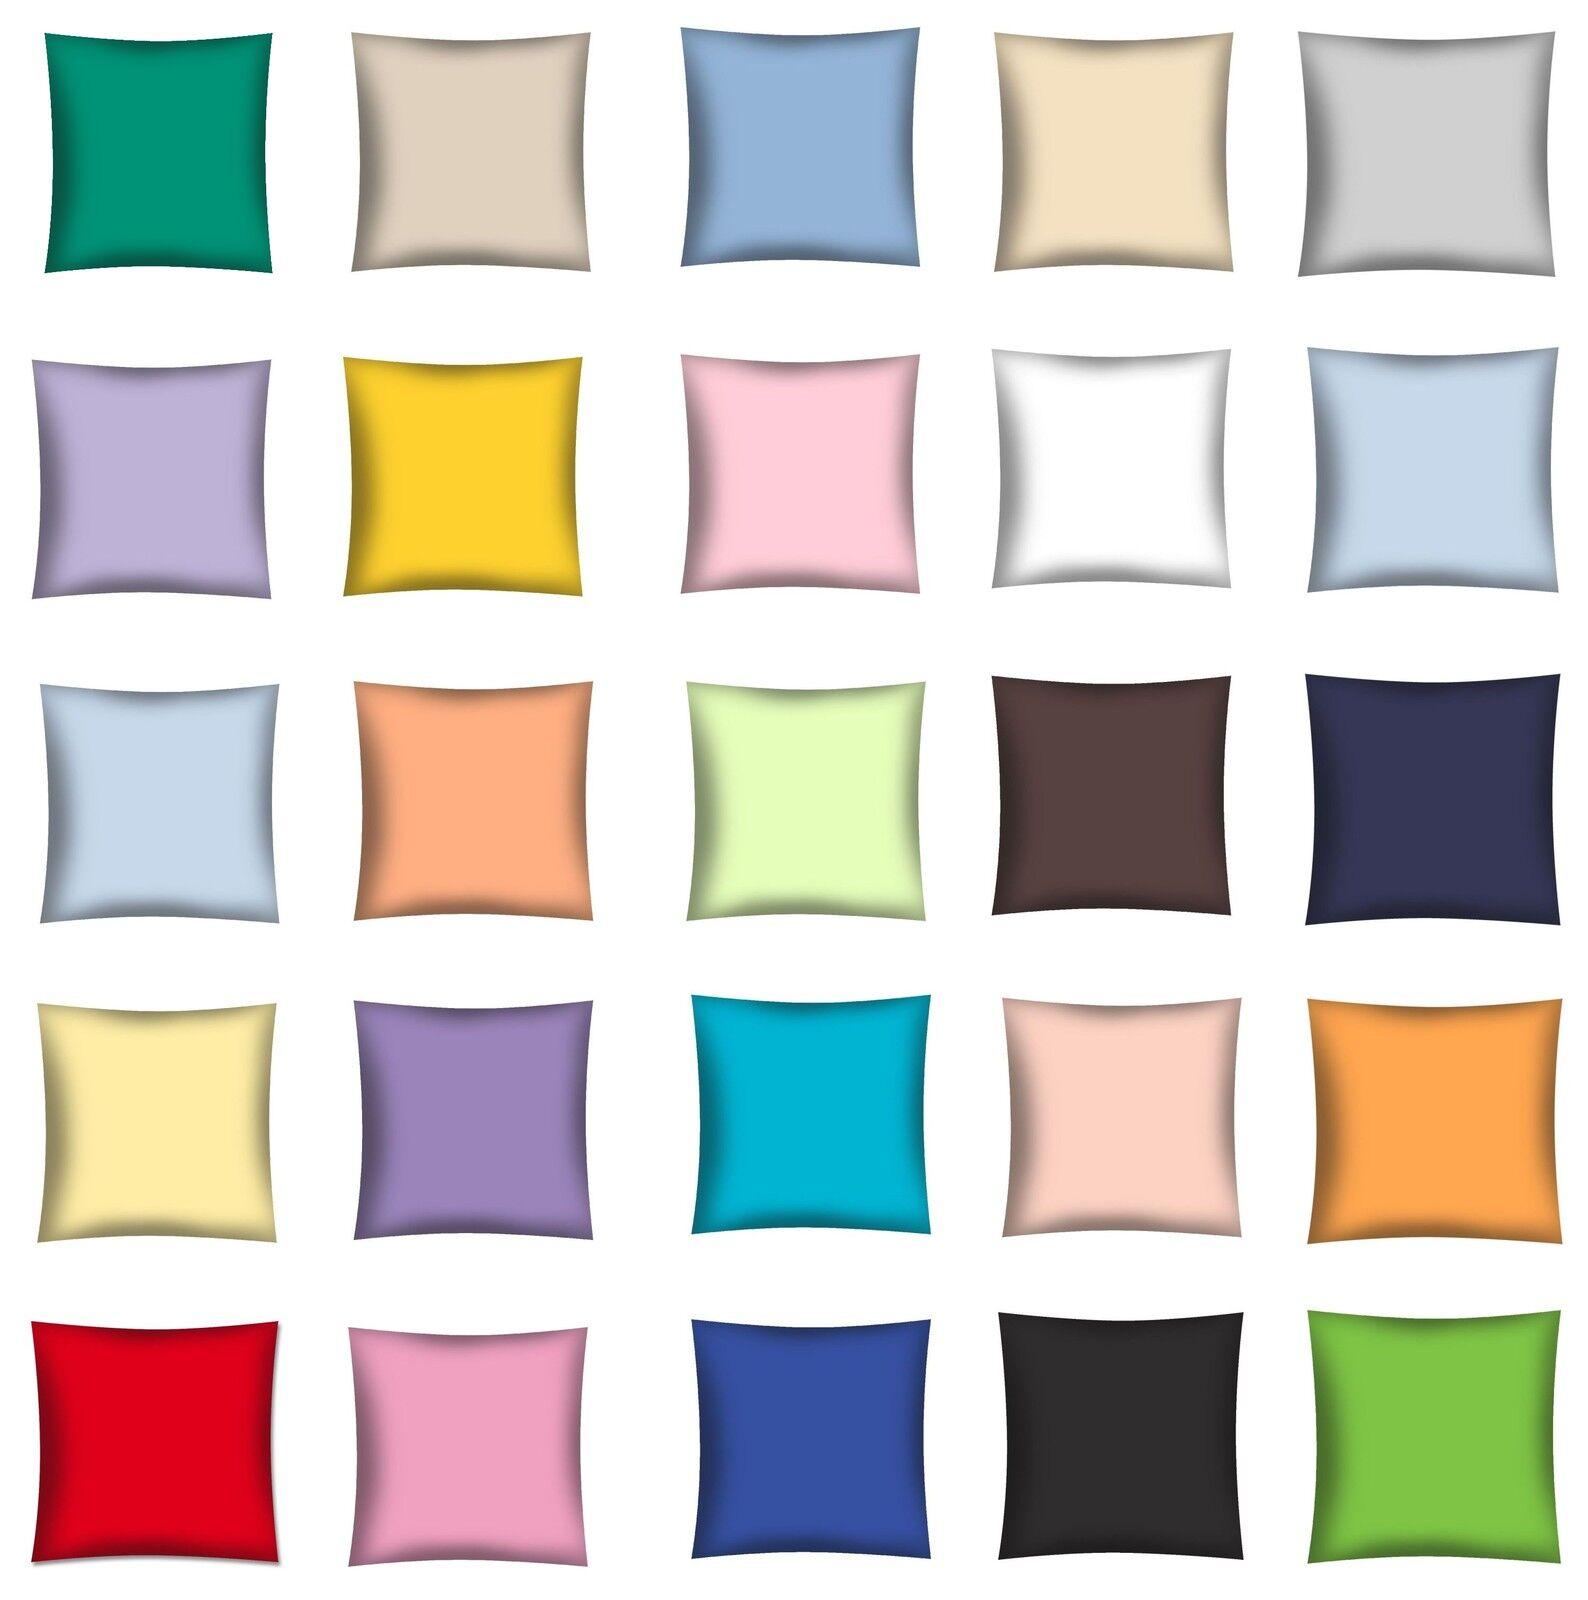 kissenbezug gelb test vergleich kissenbezug gelb. Black Bedroom Furniture Sets. Home Design Ideas